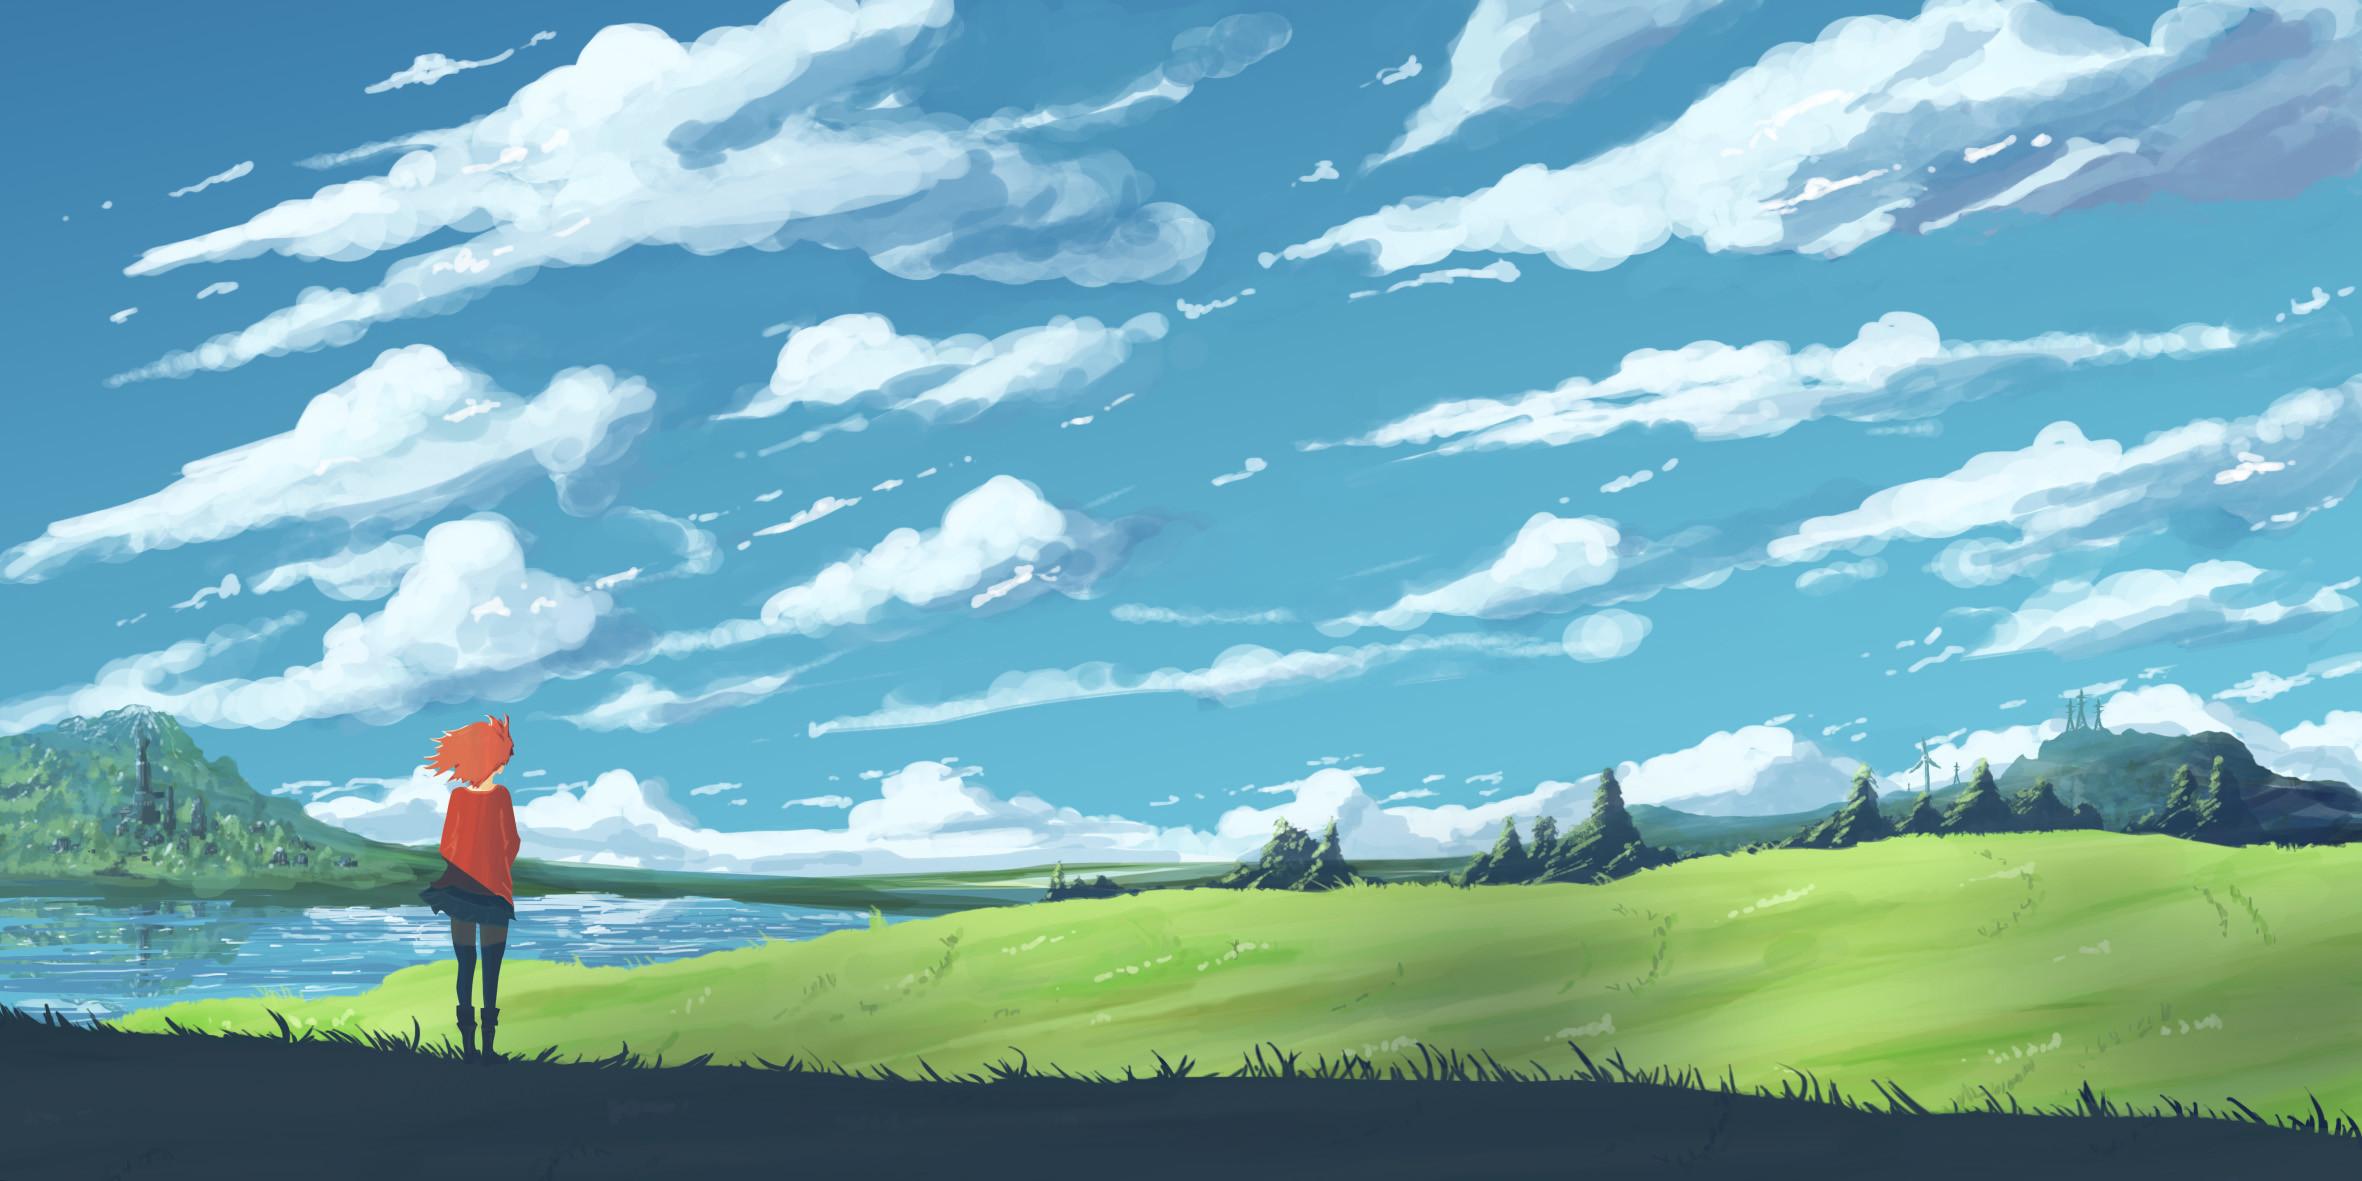 Res: 2362x1181, anime scenery girl and landscape download desktop wallpapers hd images mac  desktop wallpapers free hd tablet smart phone 2362×1181 Wallpaper HD